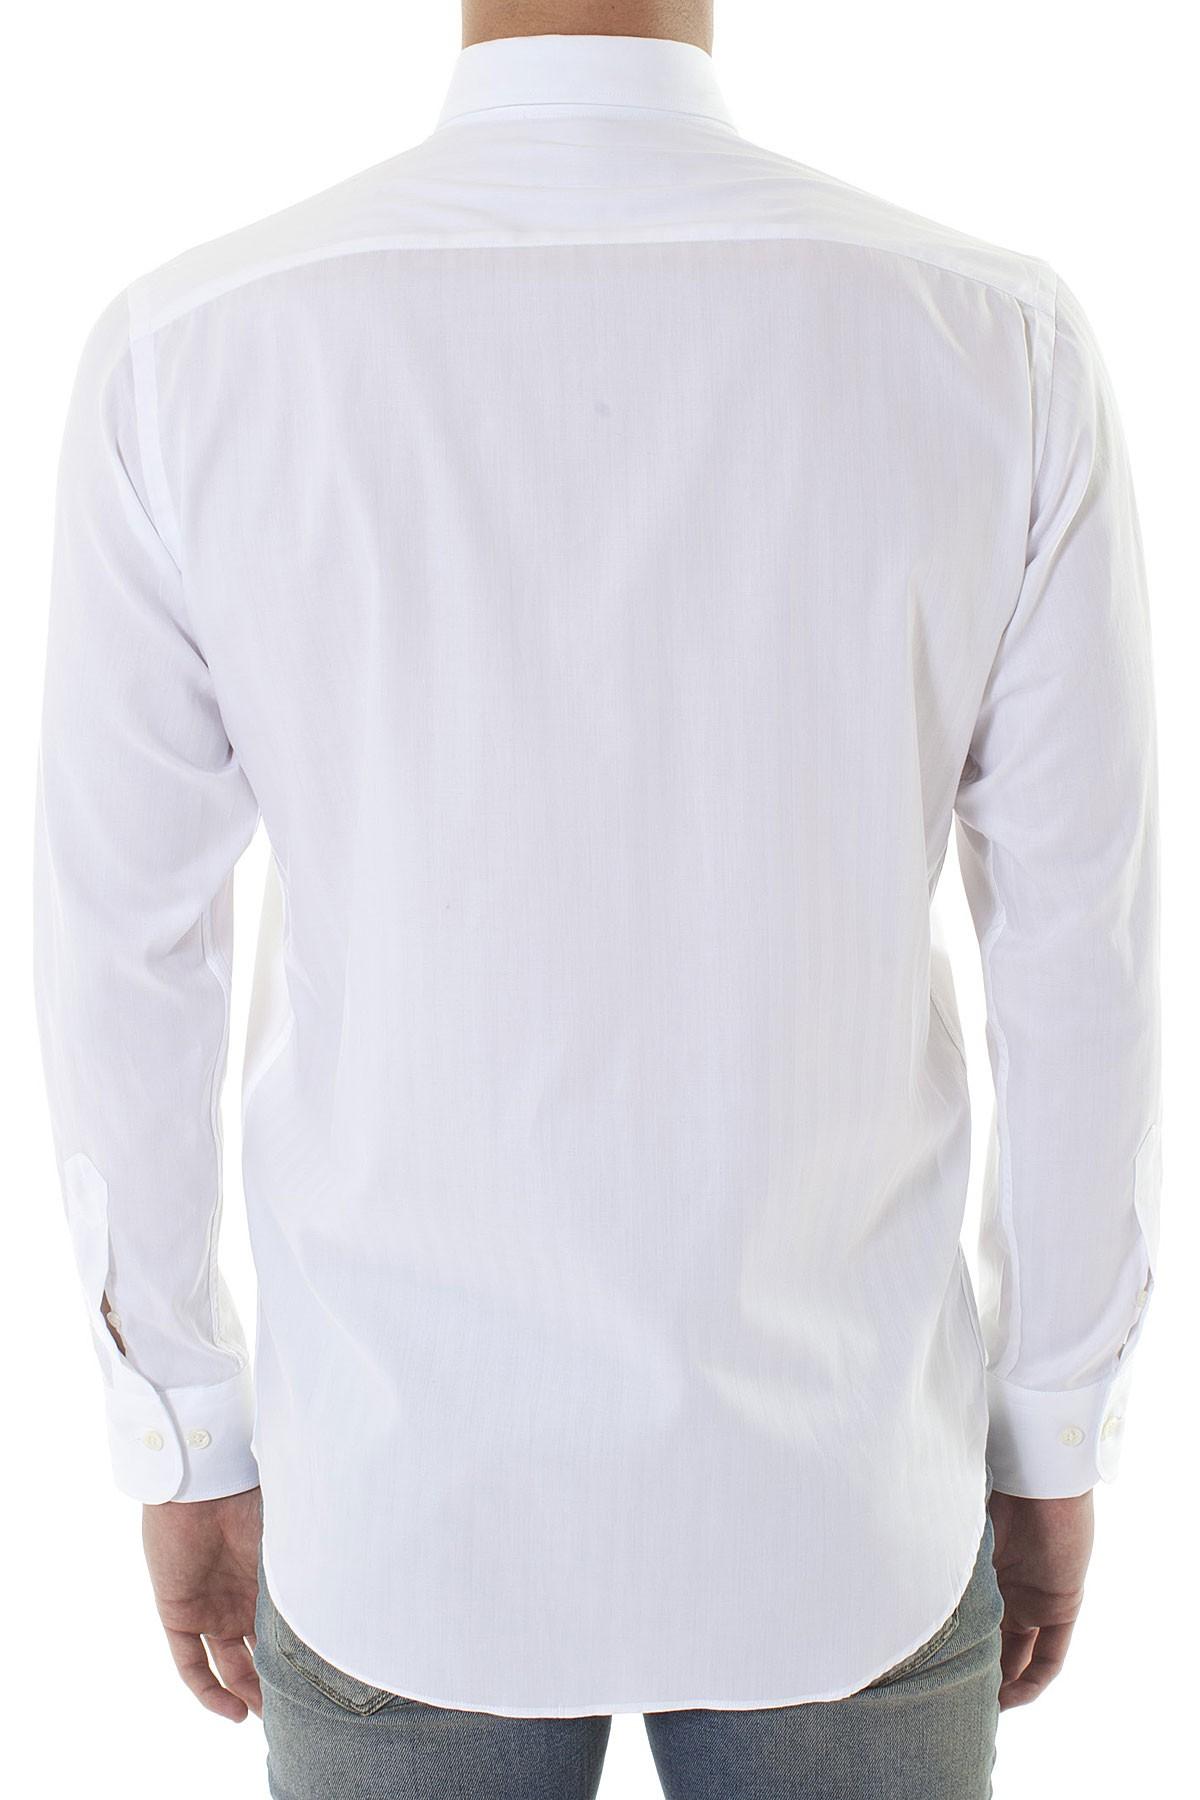 Etro white shirt for men rione fontana for Etro men s shirts